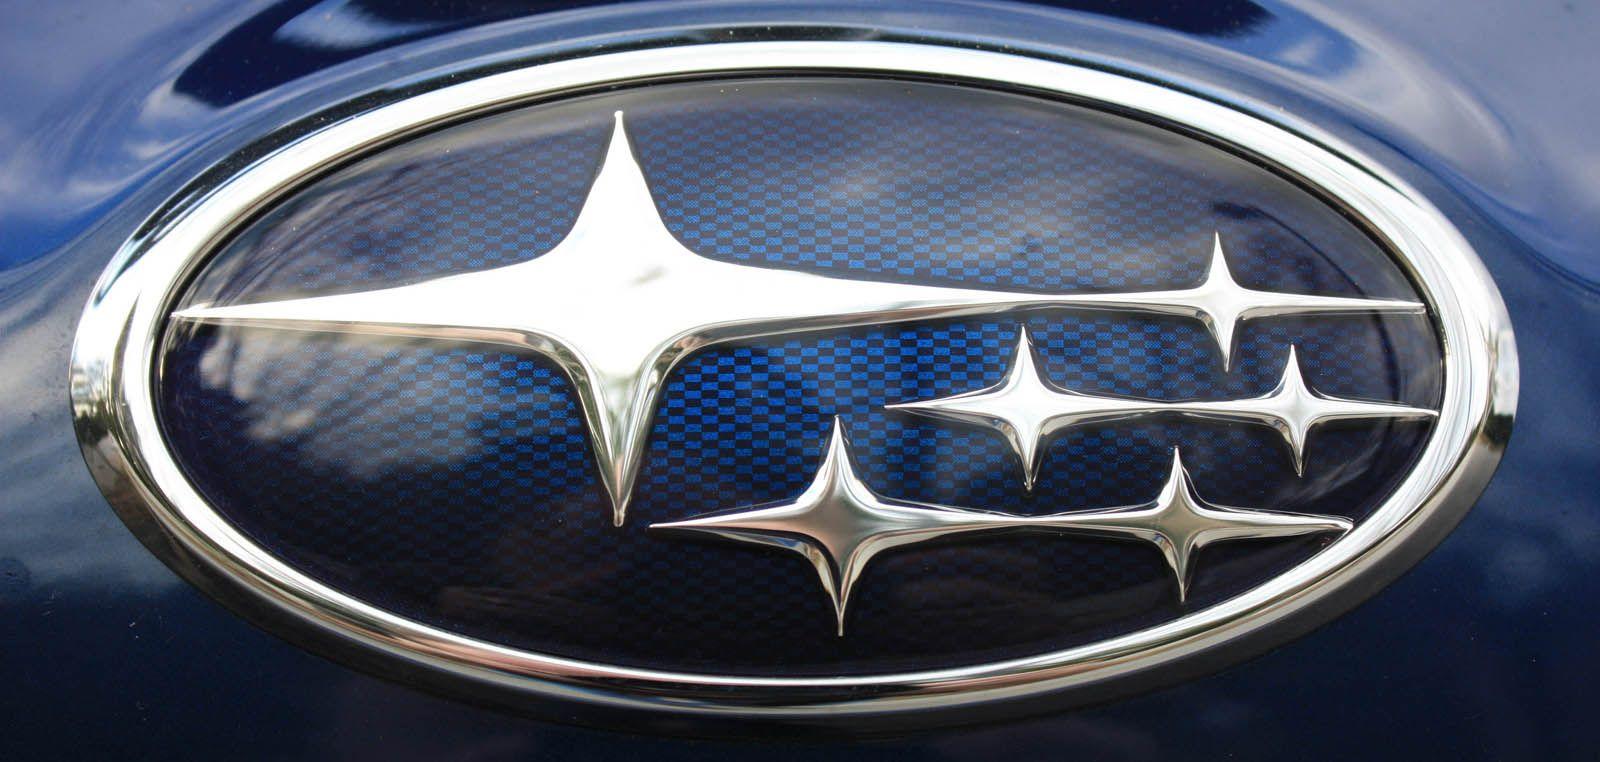 Le logo Subaru Subaru logo, Subaru